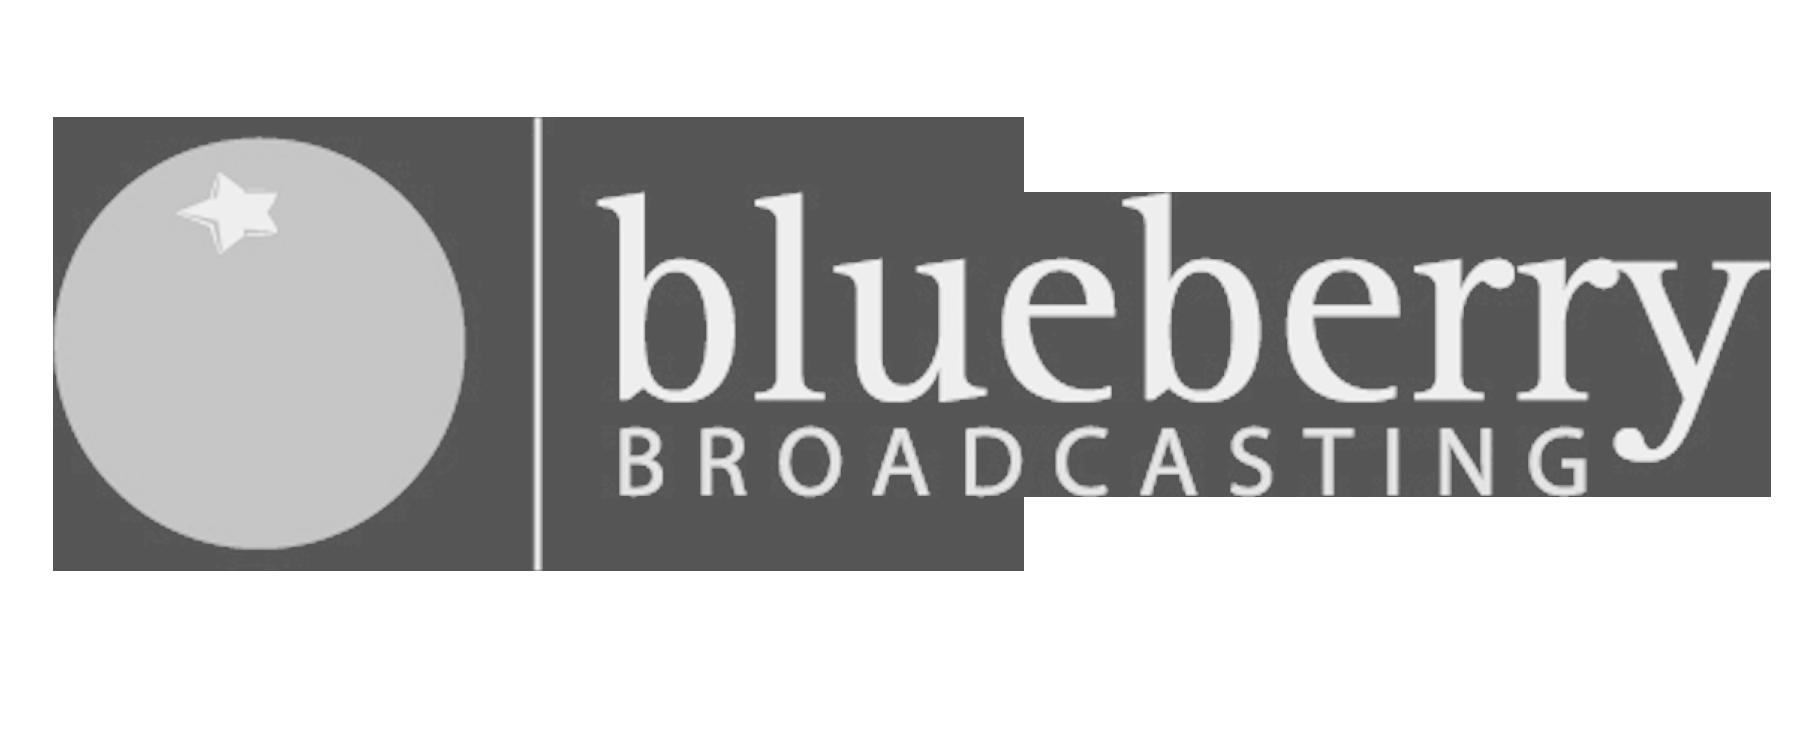 175 Blueberry Broadcasting LLC